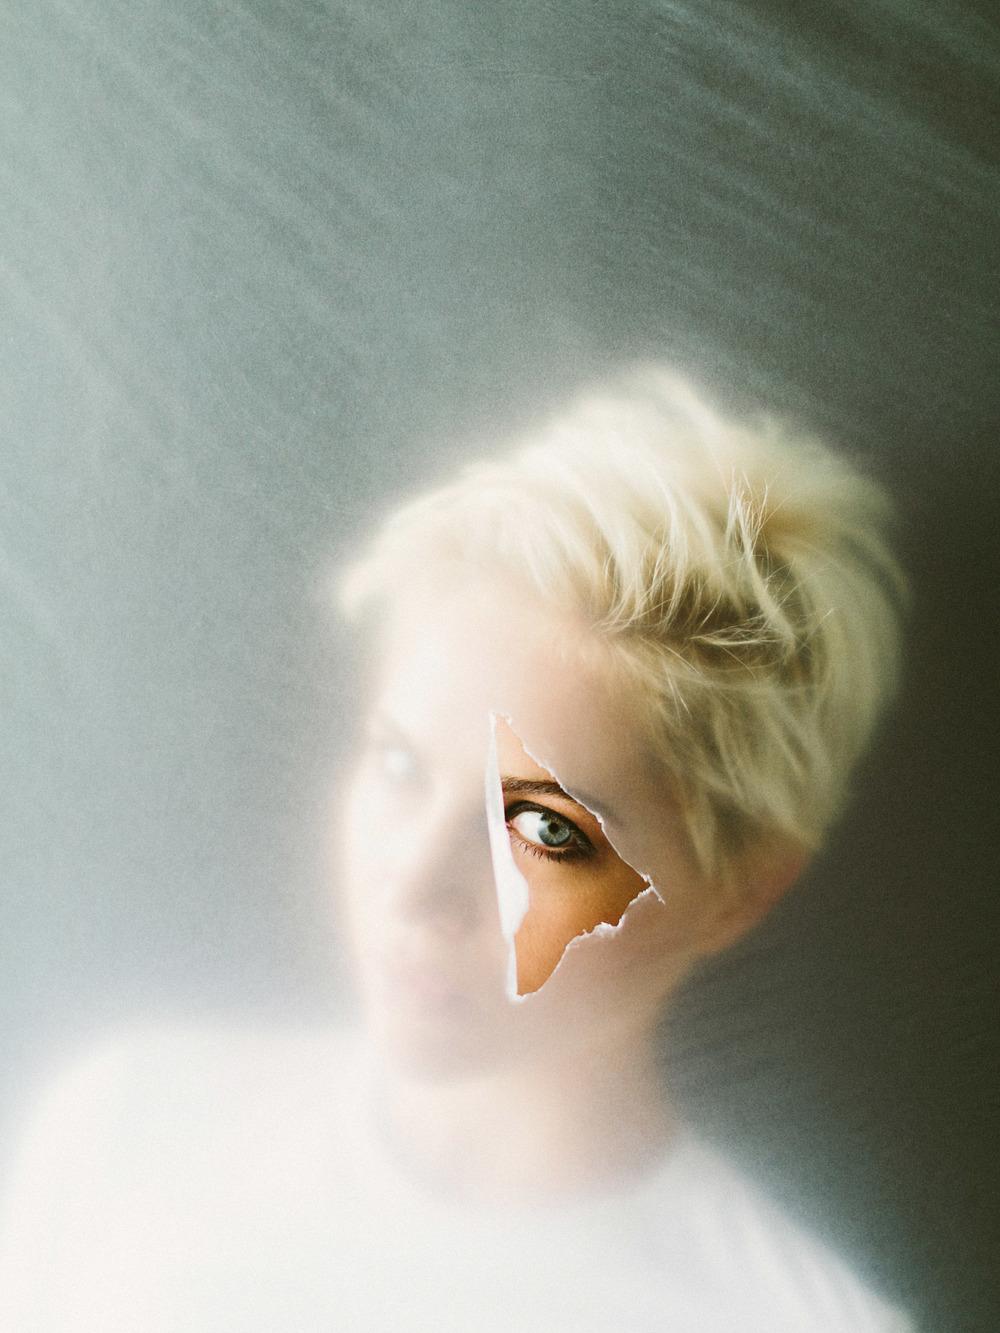 Shooting through plastic  | Katch Silva